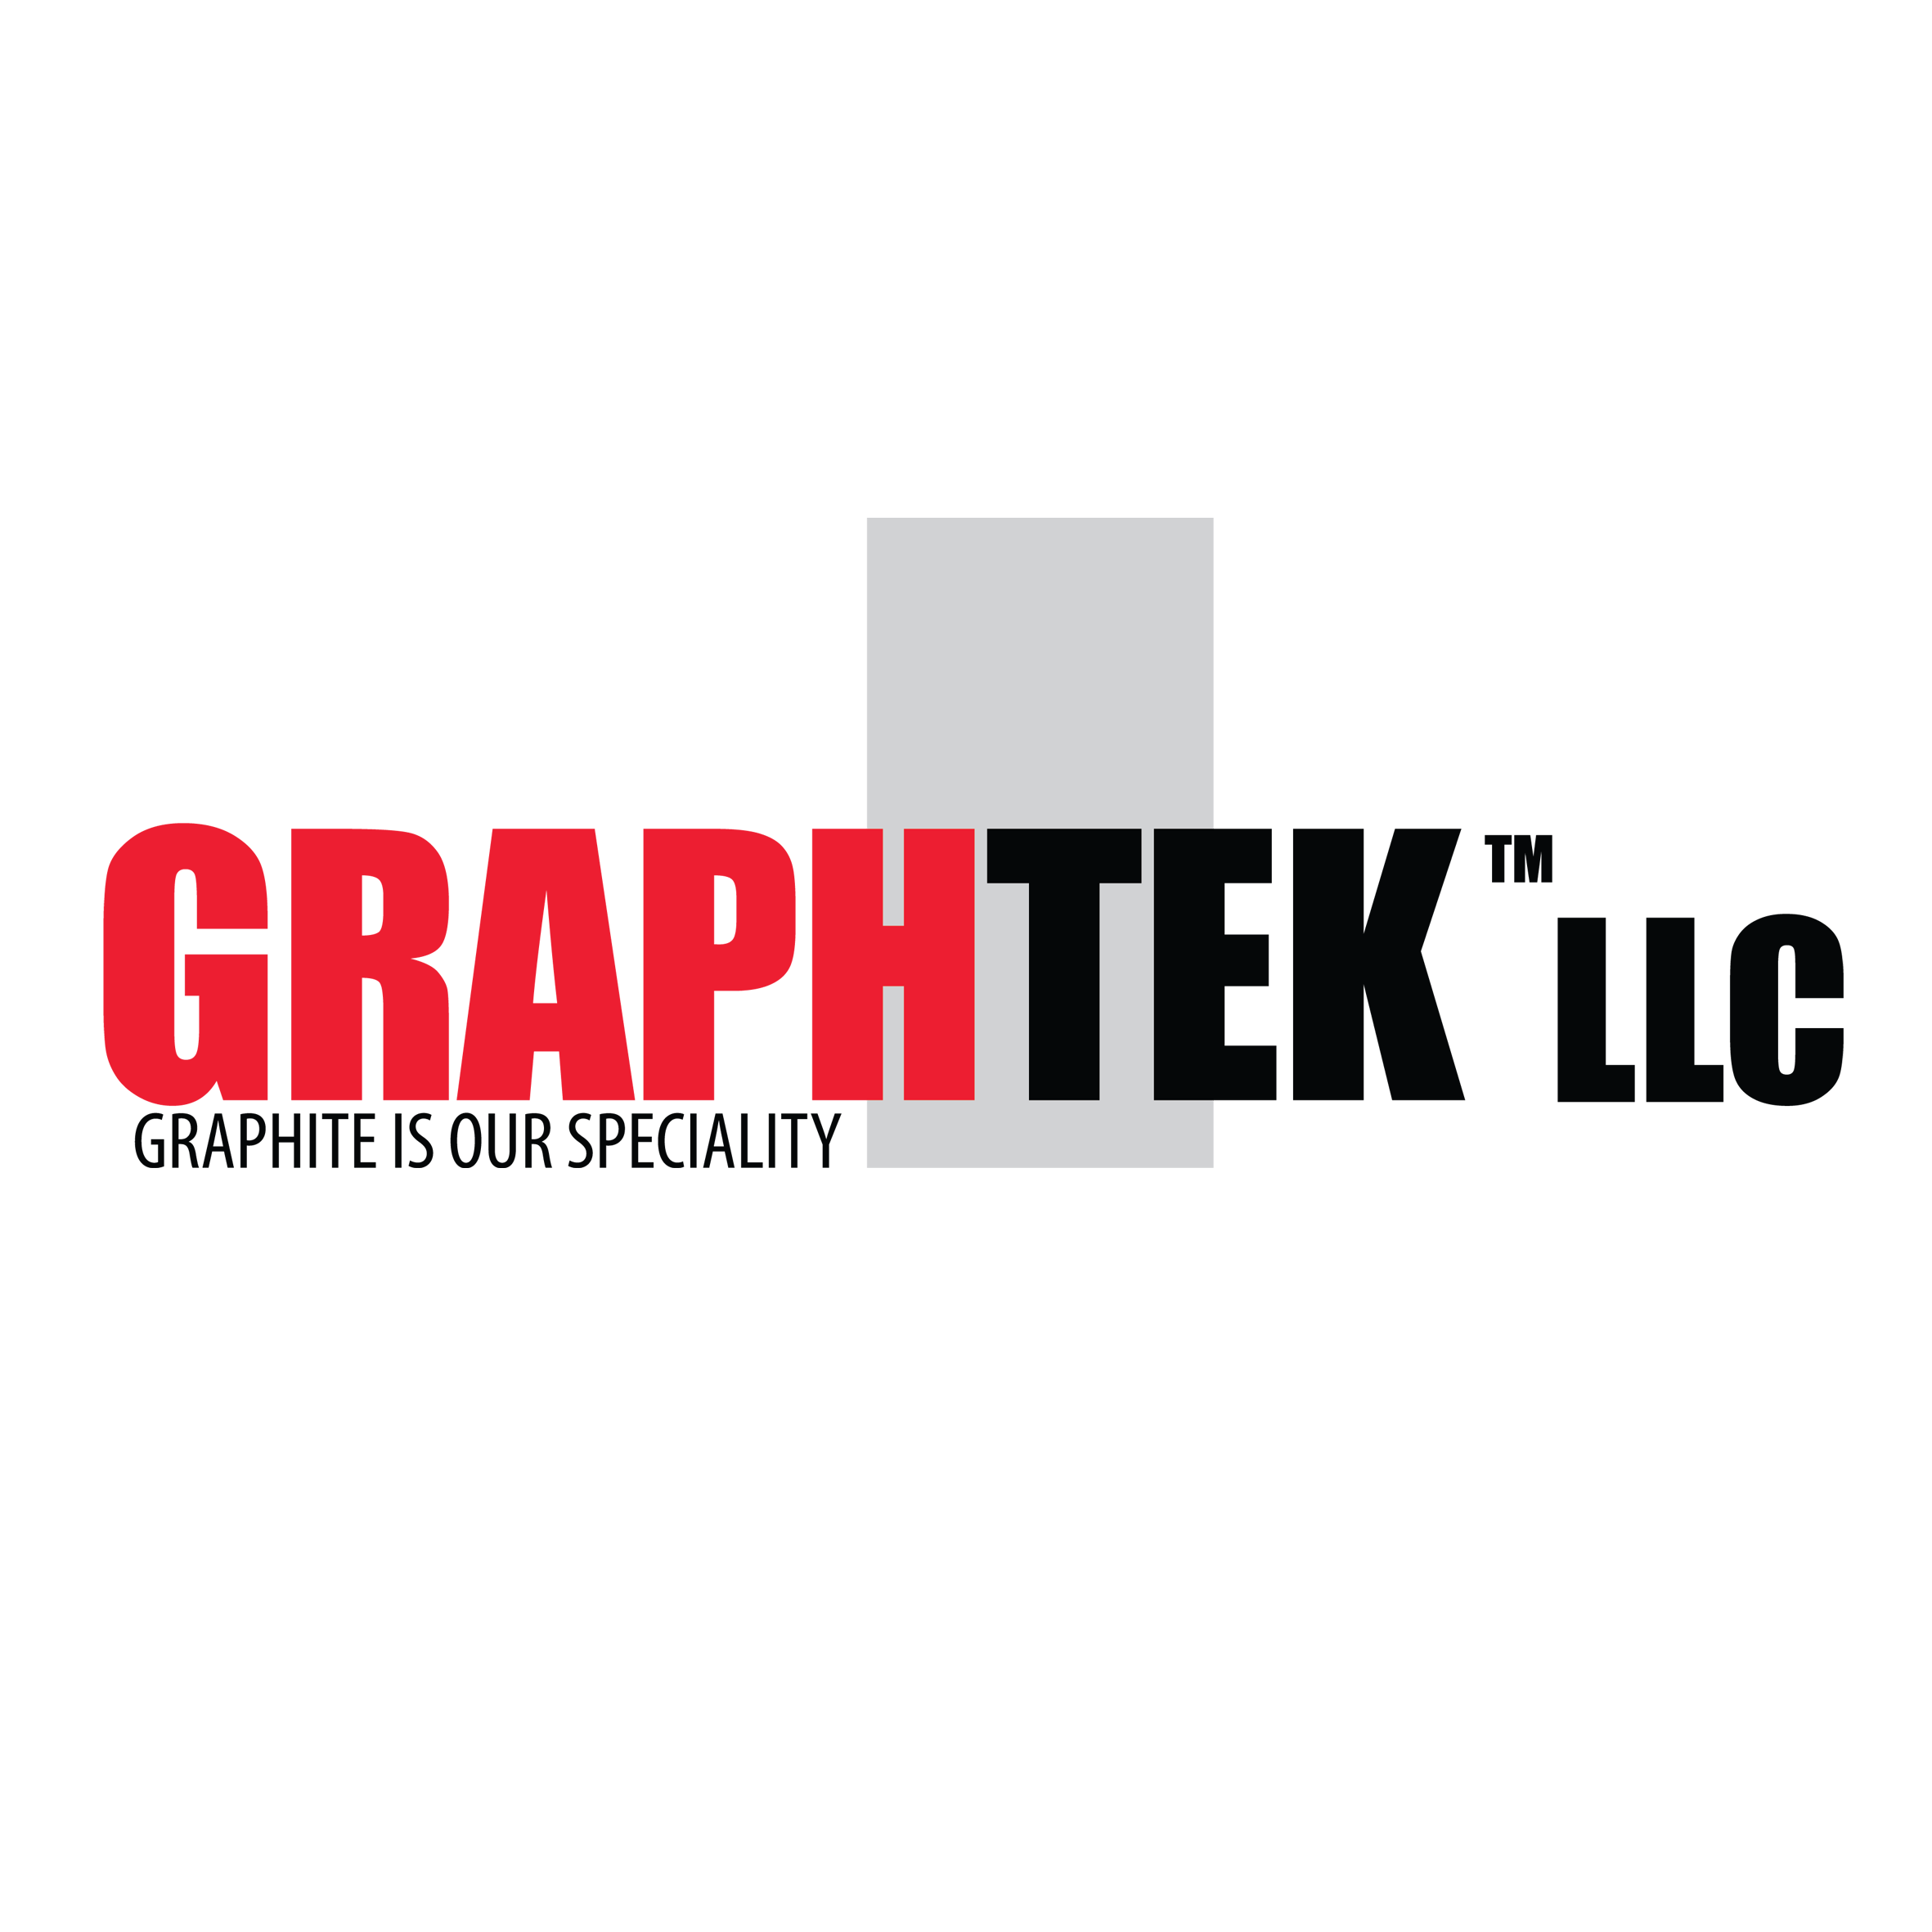 graphtek